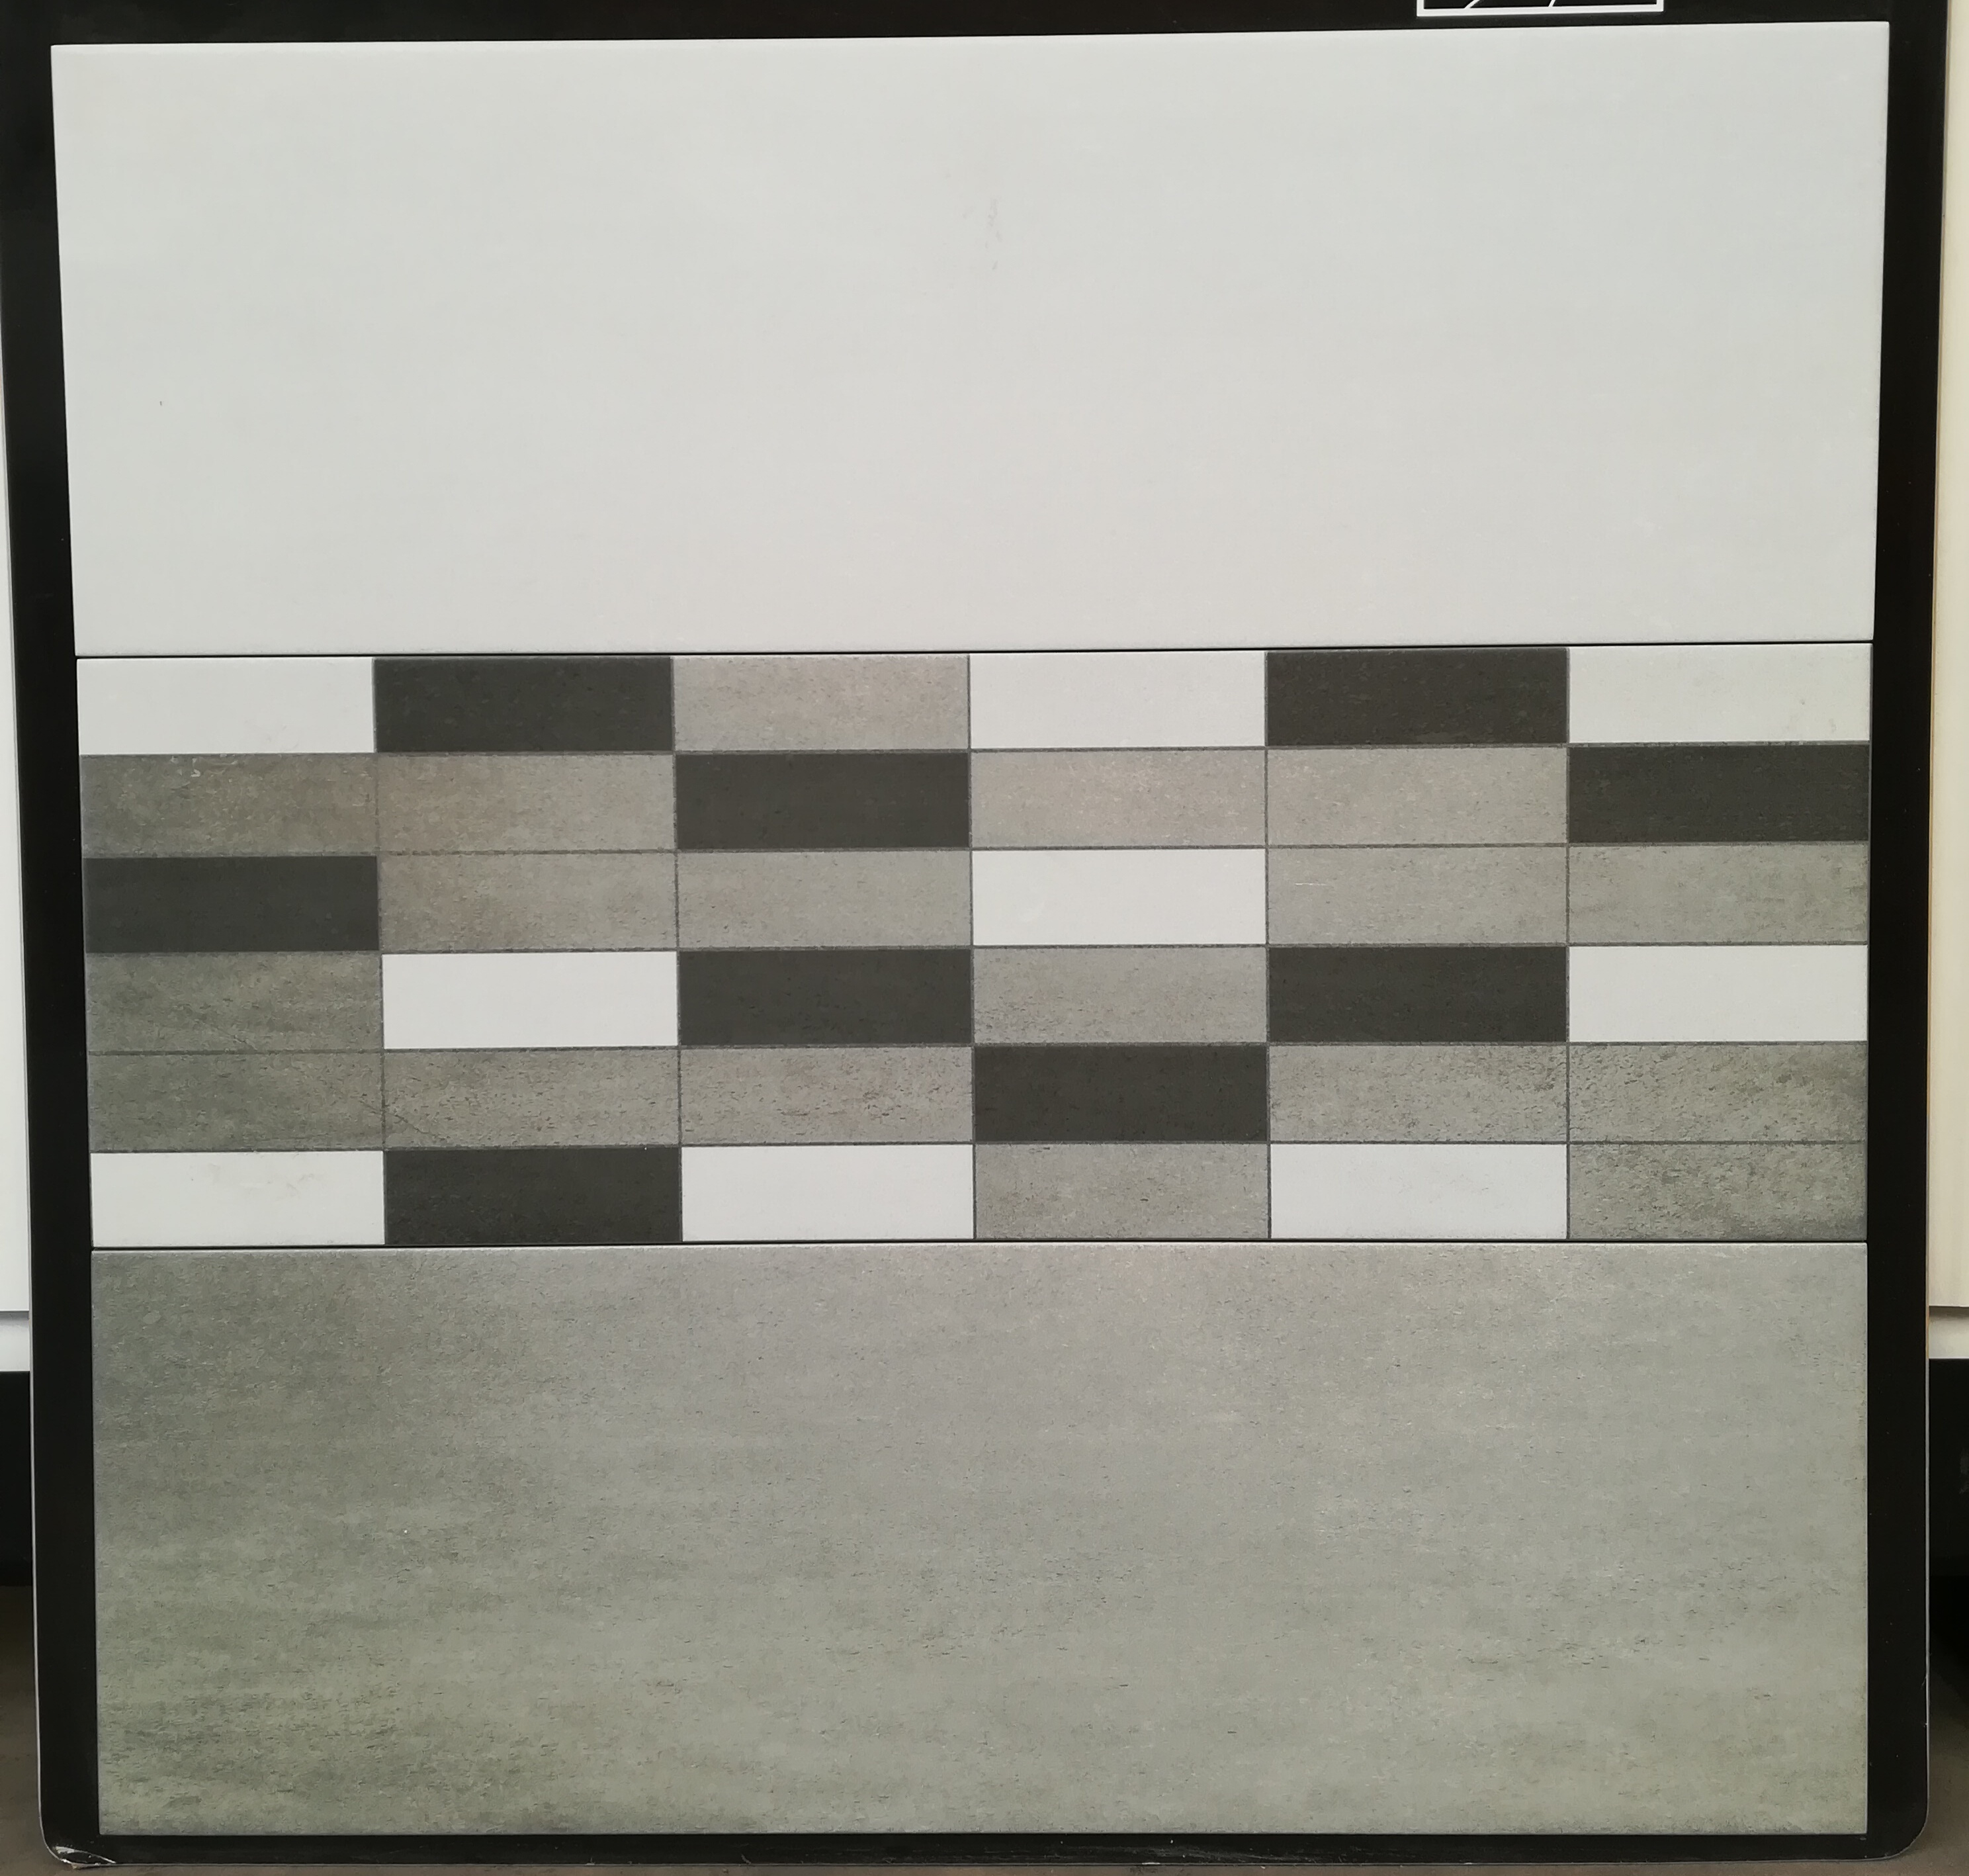 Luan Bone / Brick Grey /Luan grey